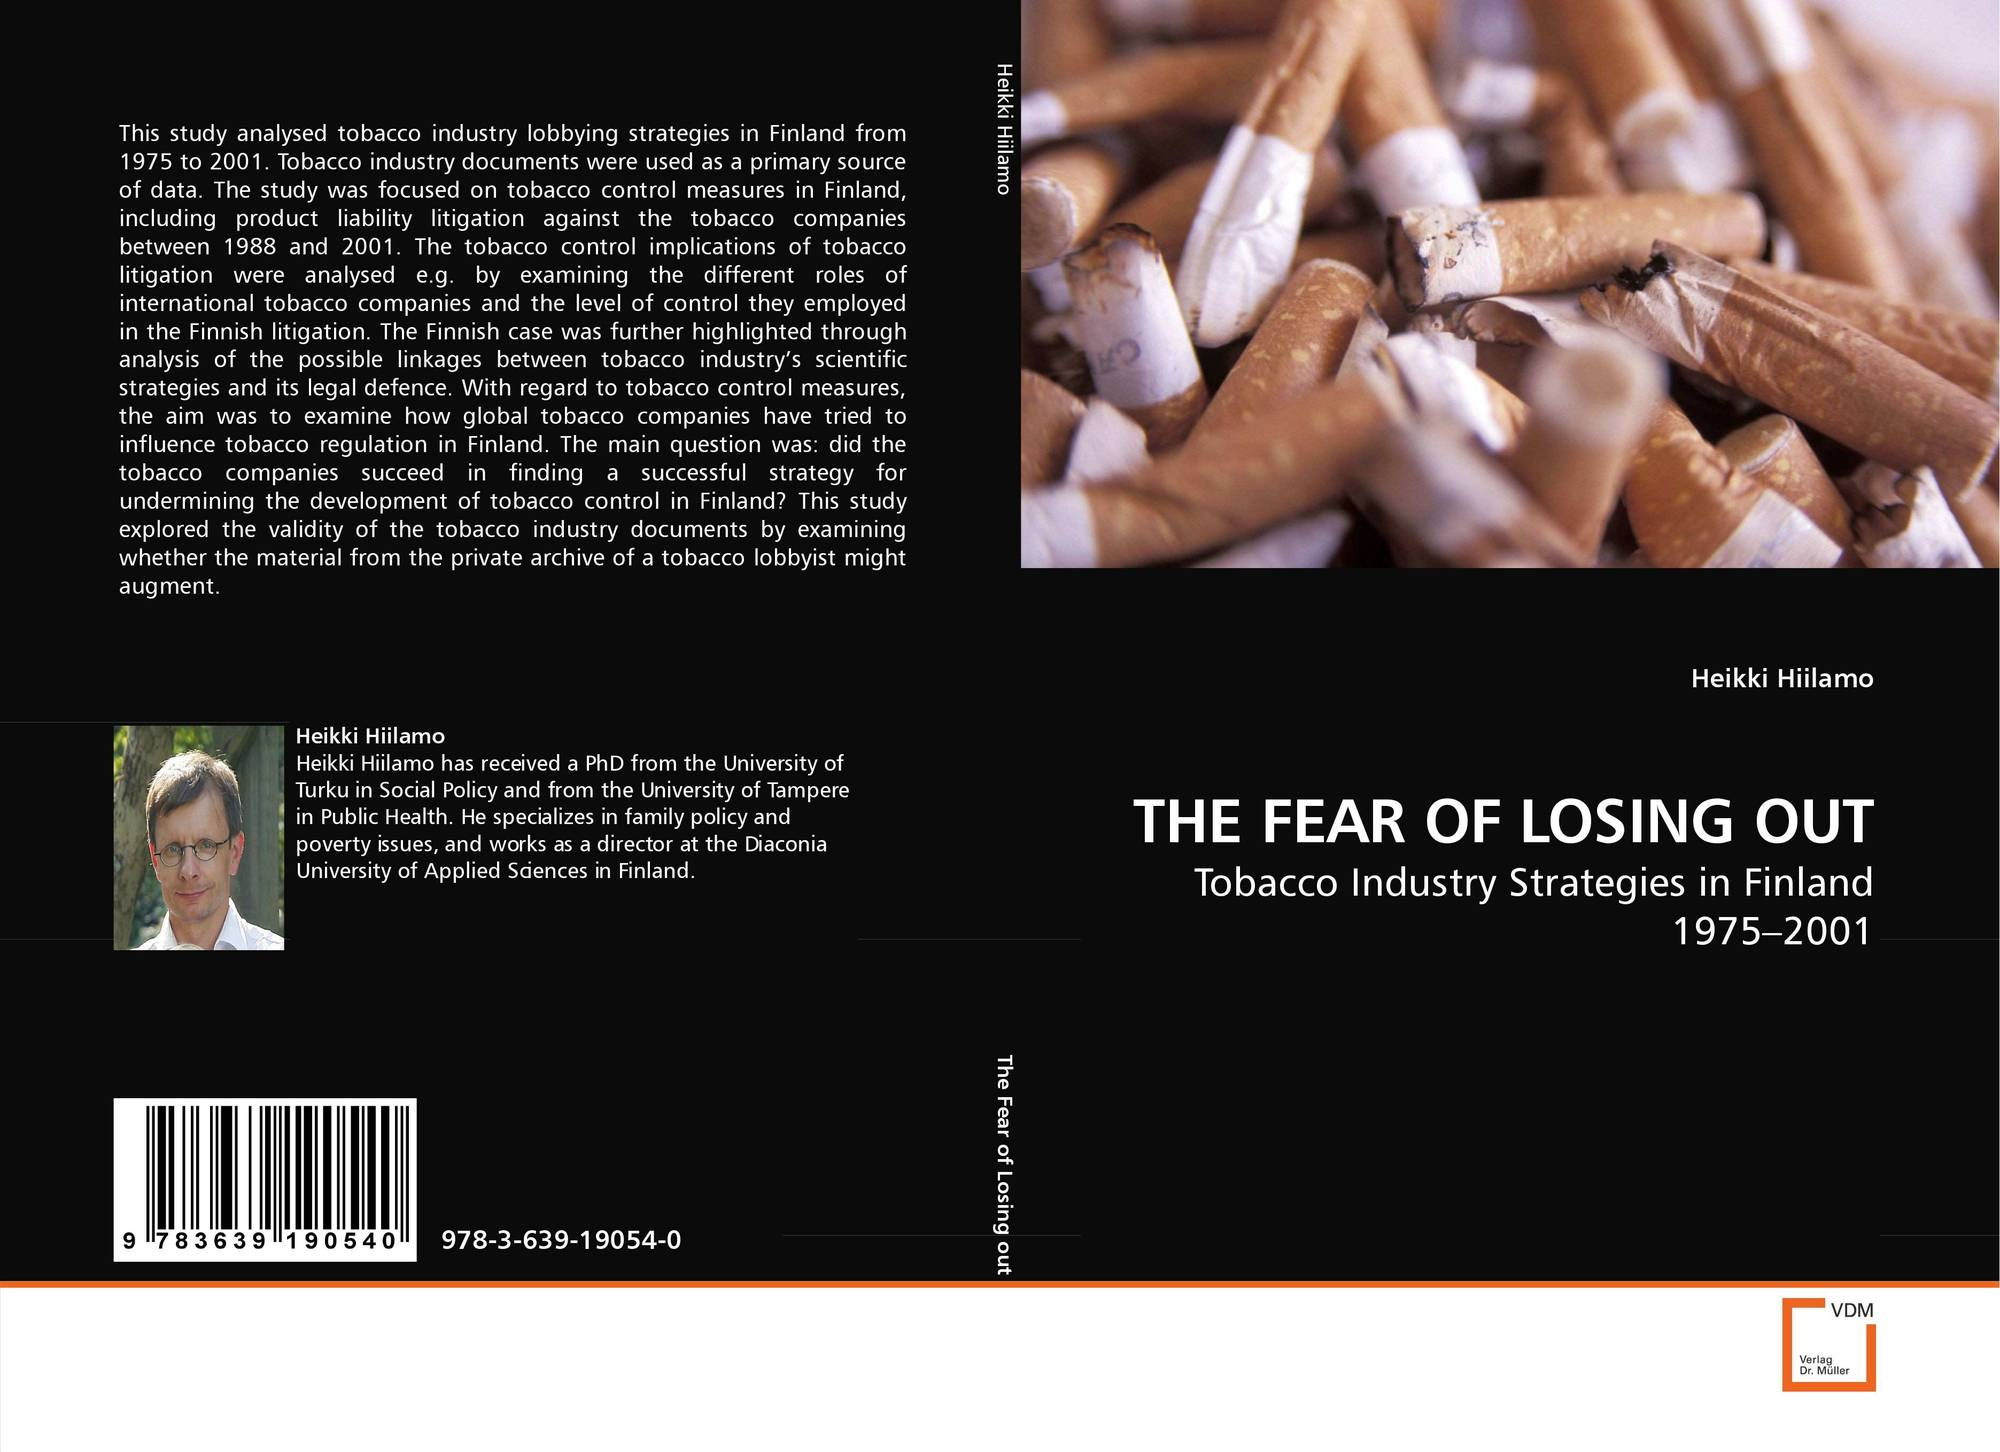 finland and nokia case study analysis